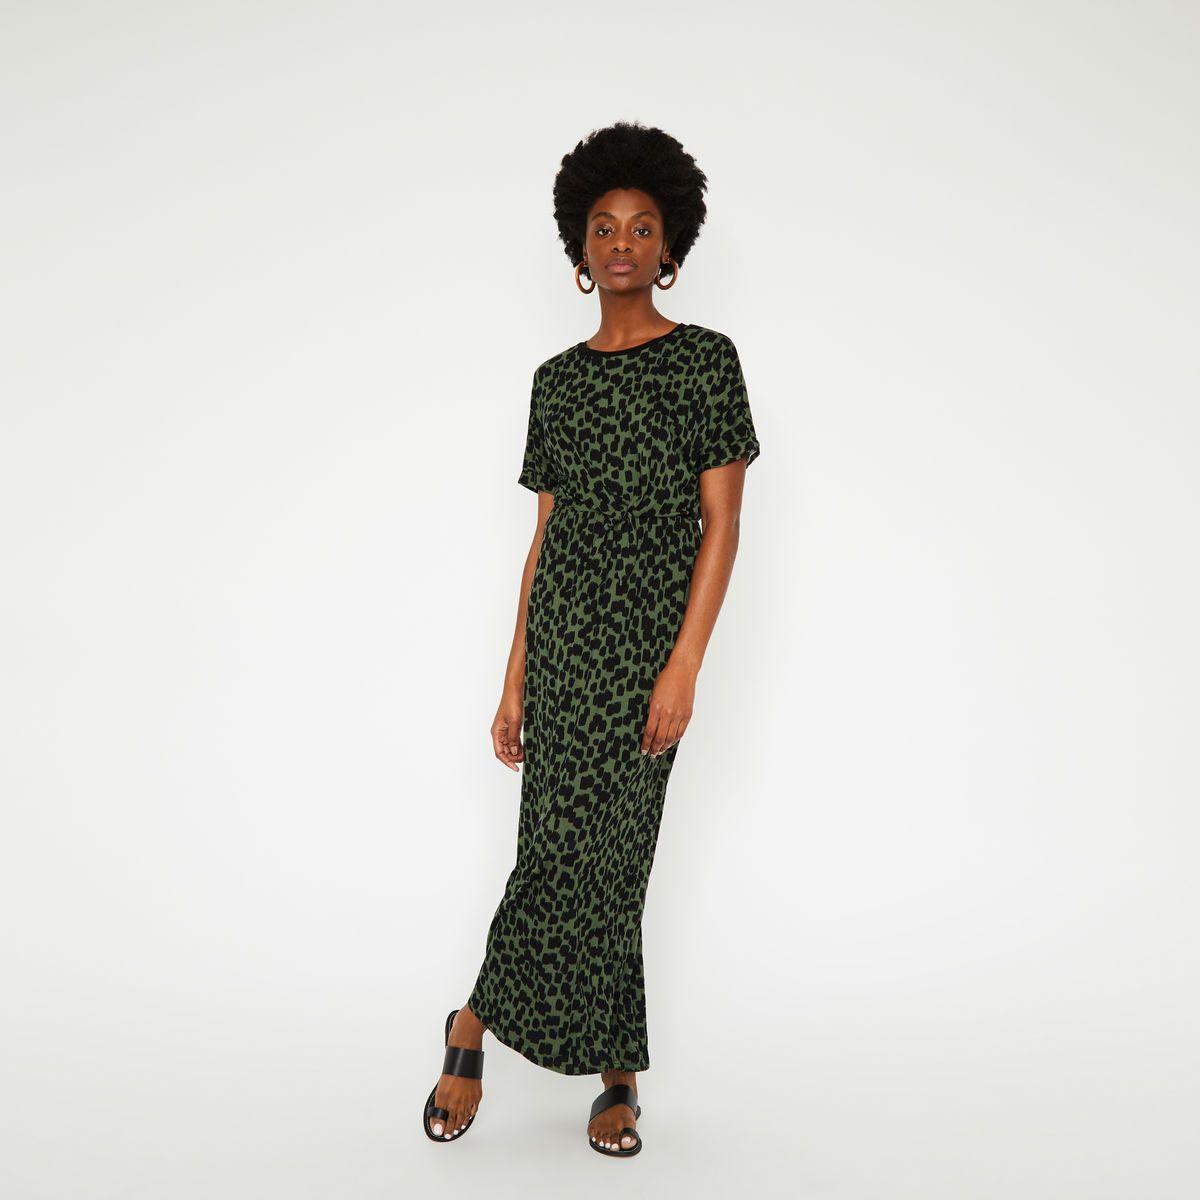 b81806de979 Brushed cheetah maxi dress in 2019